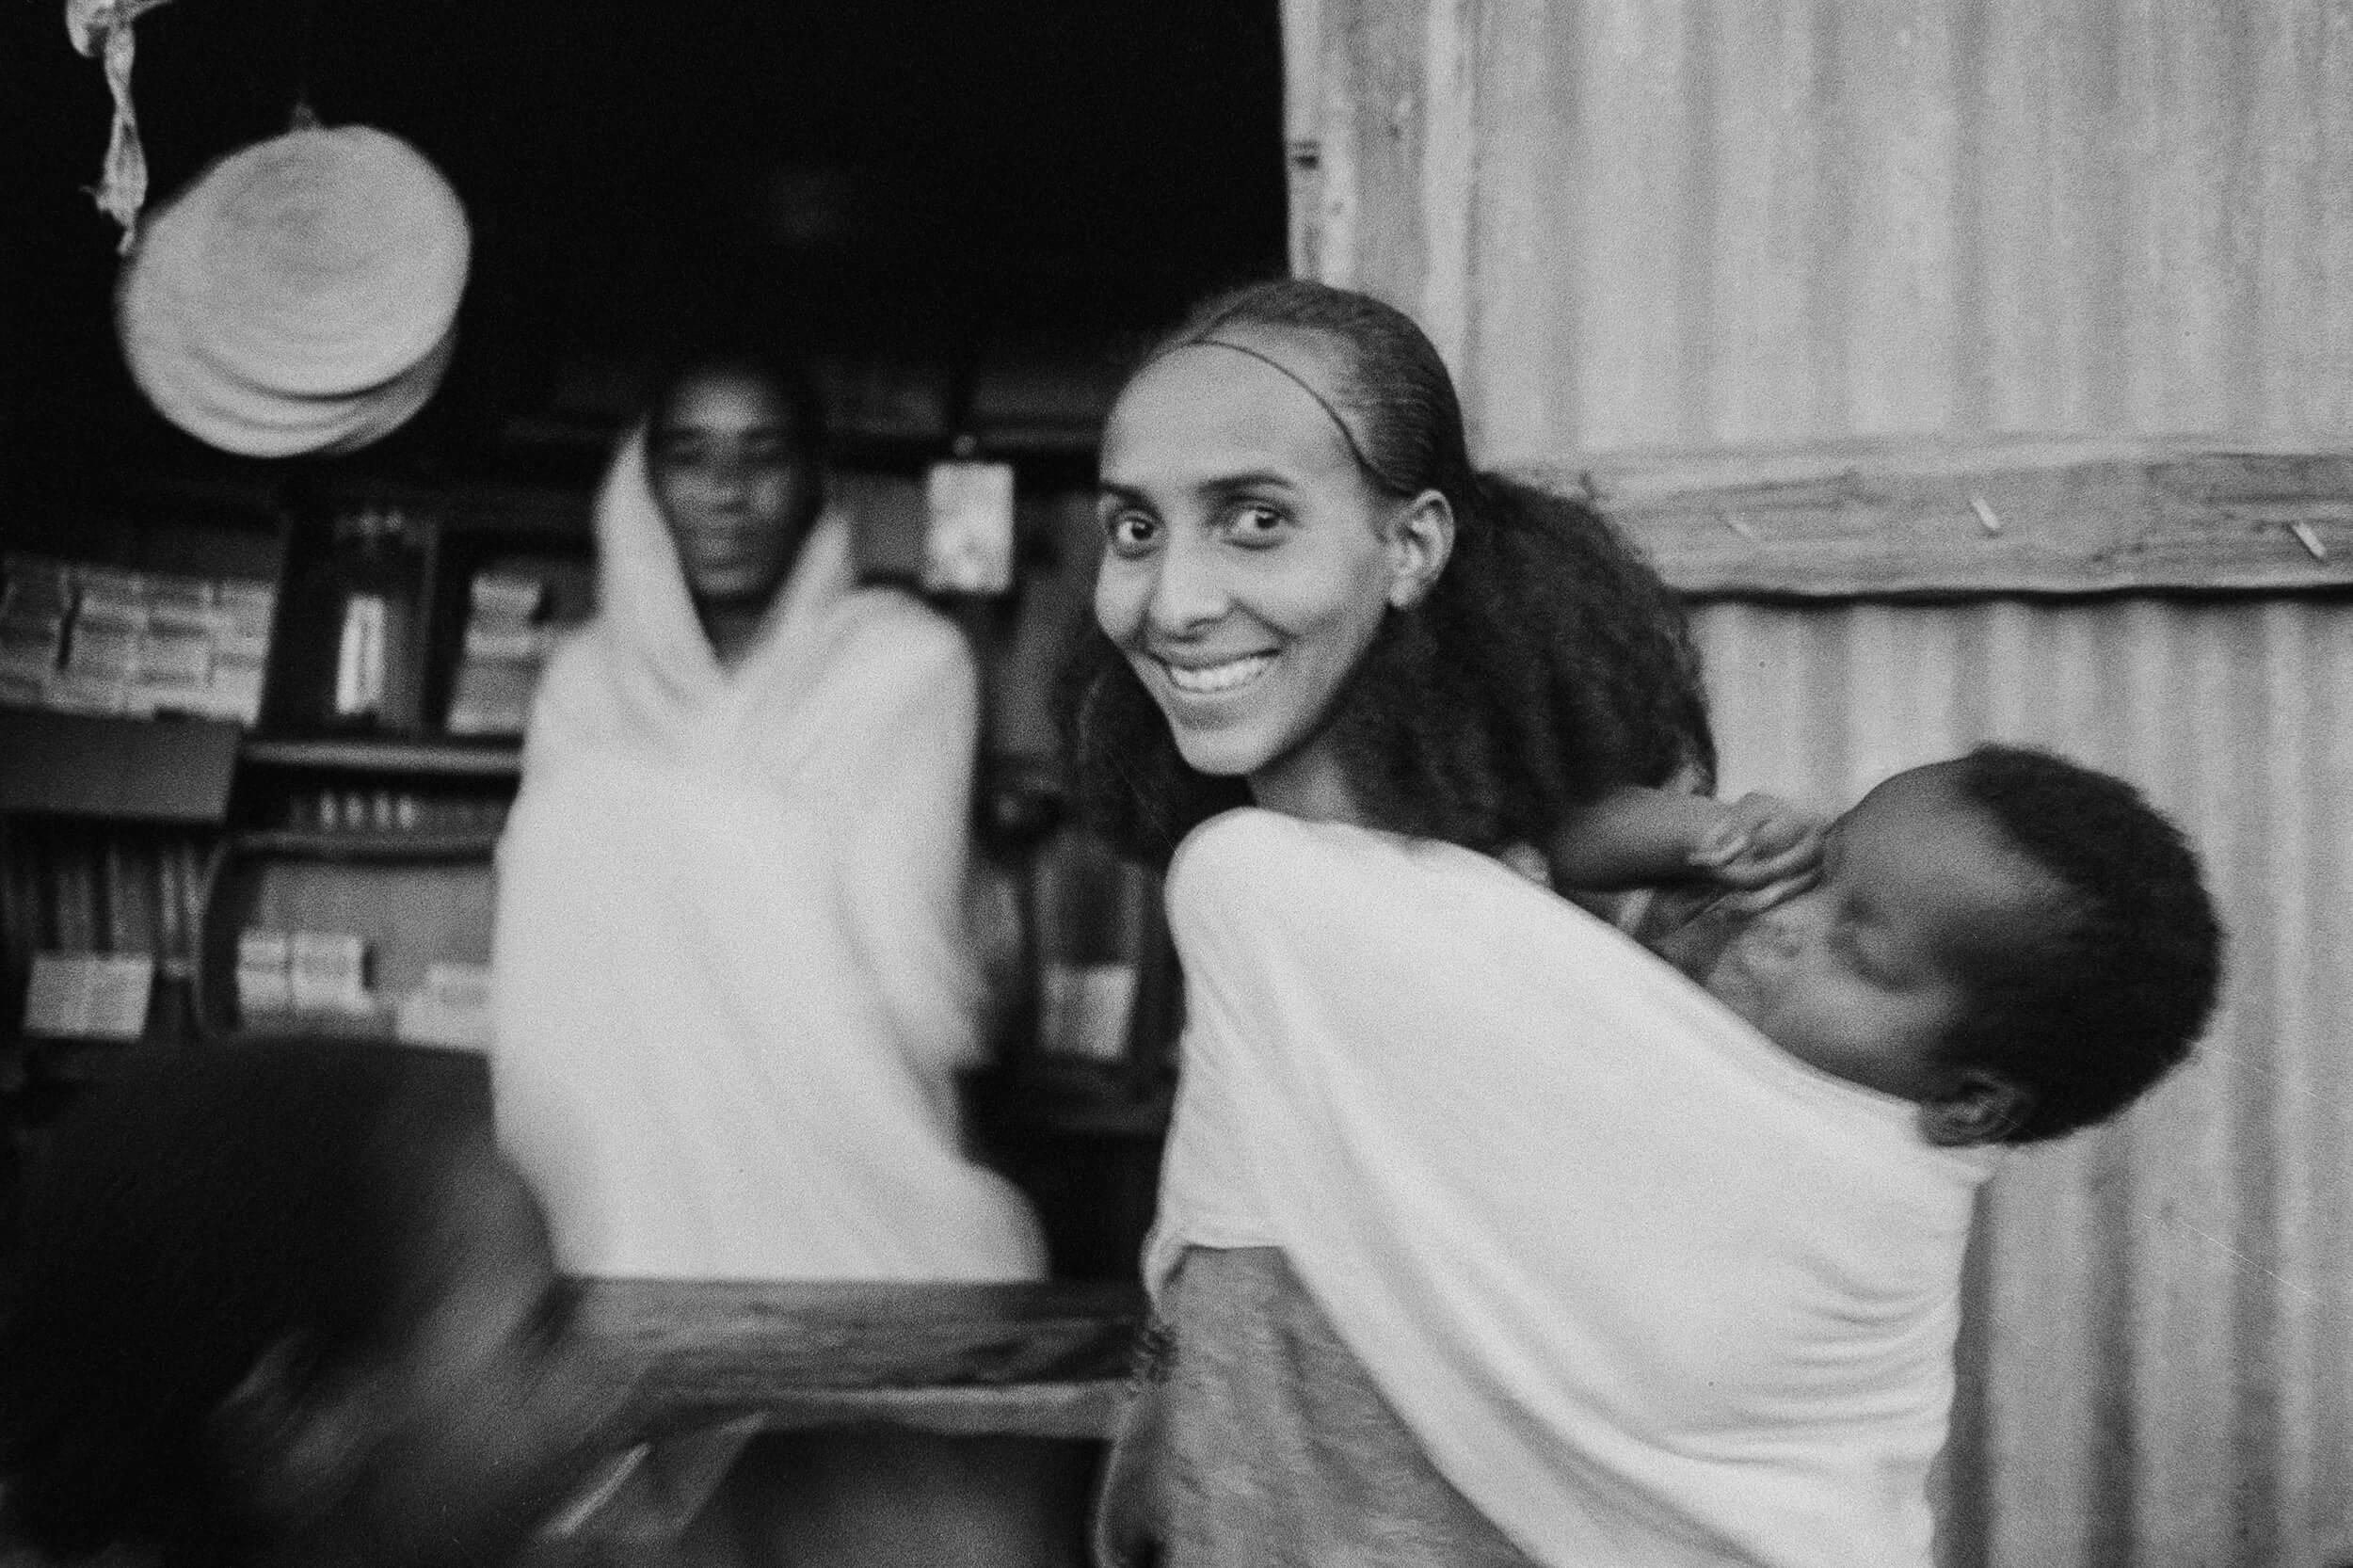 At dusk, the Ethiopian bombings cease and the market can open again. Segeneiti, Eritea 1990.